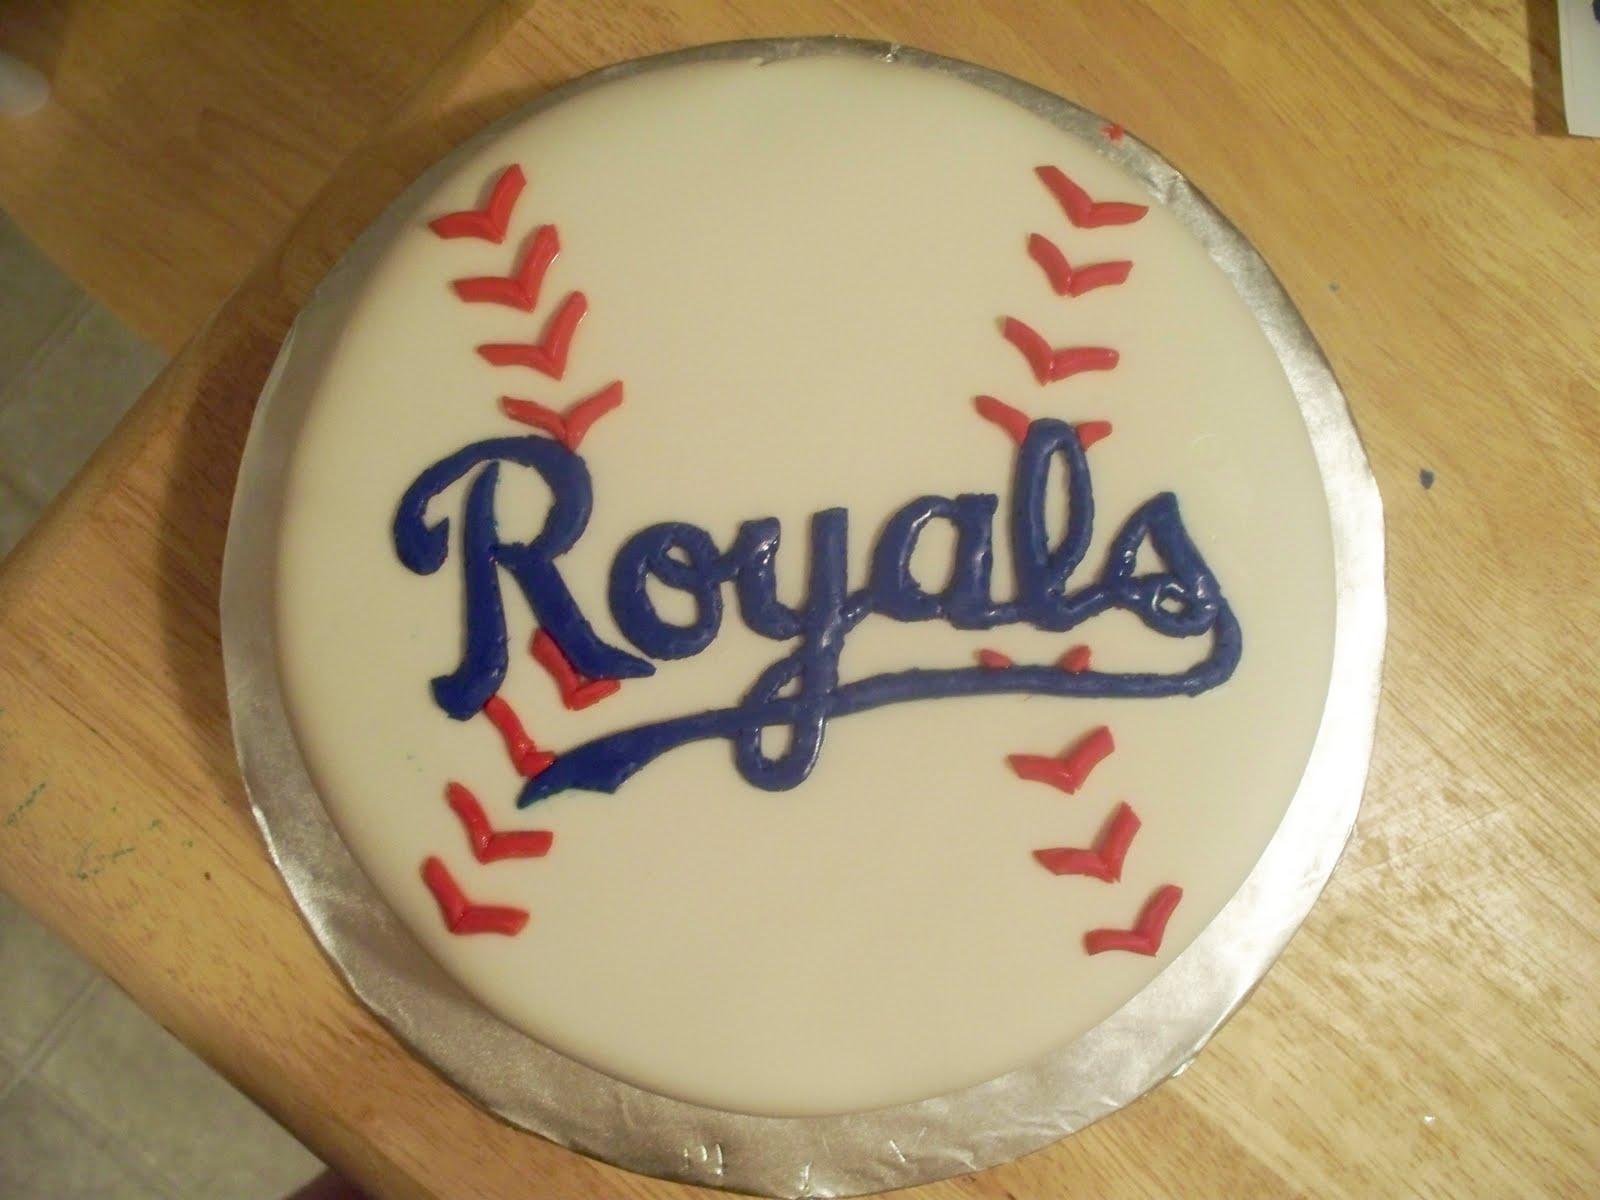 Softball Score Sheet Cake Ideas and Designs